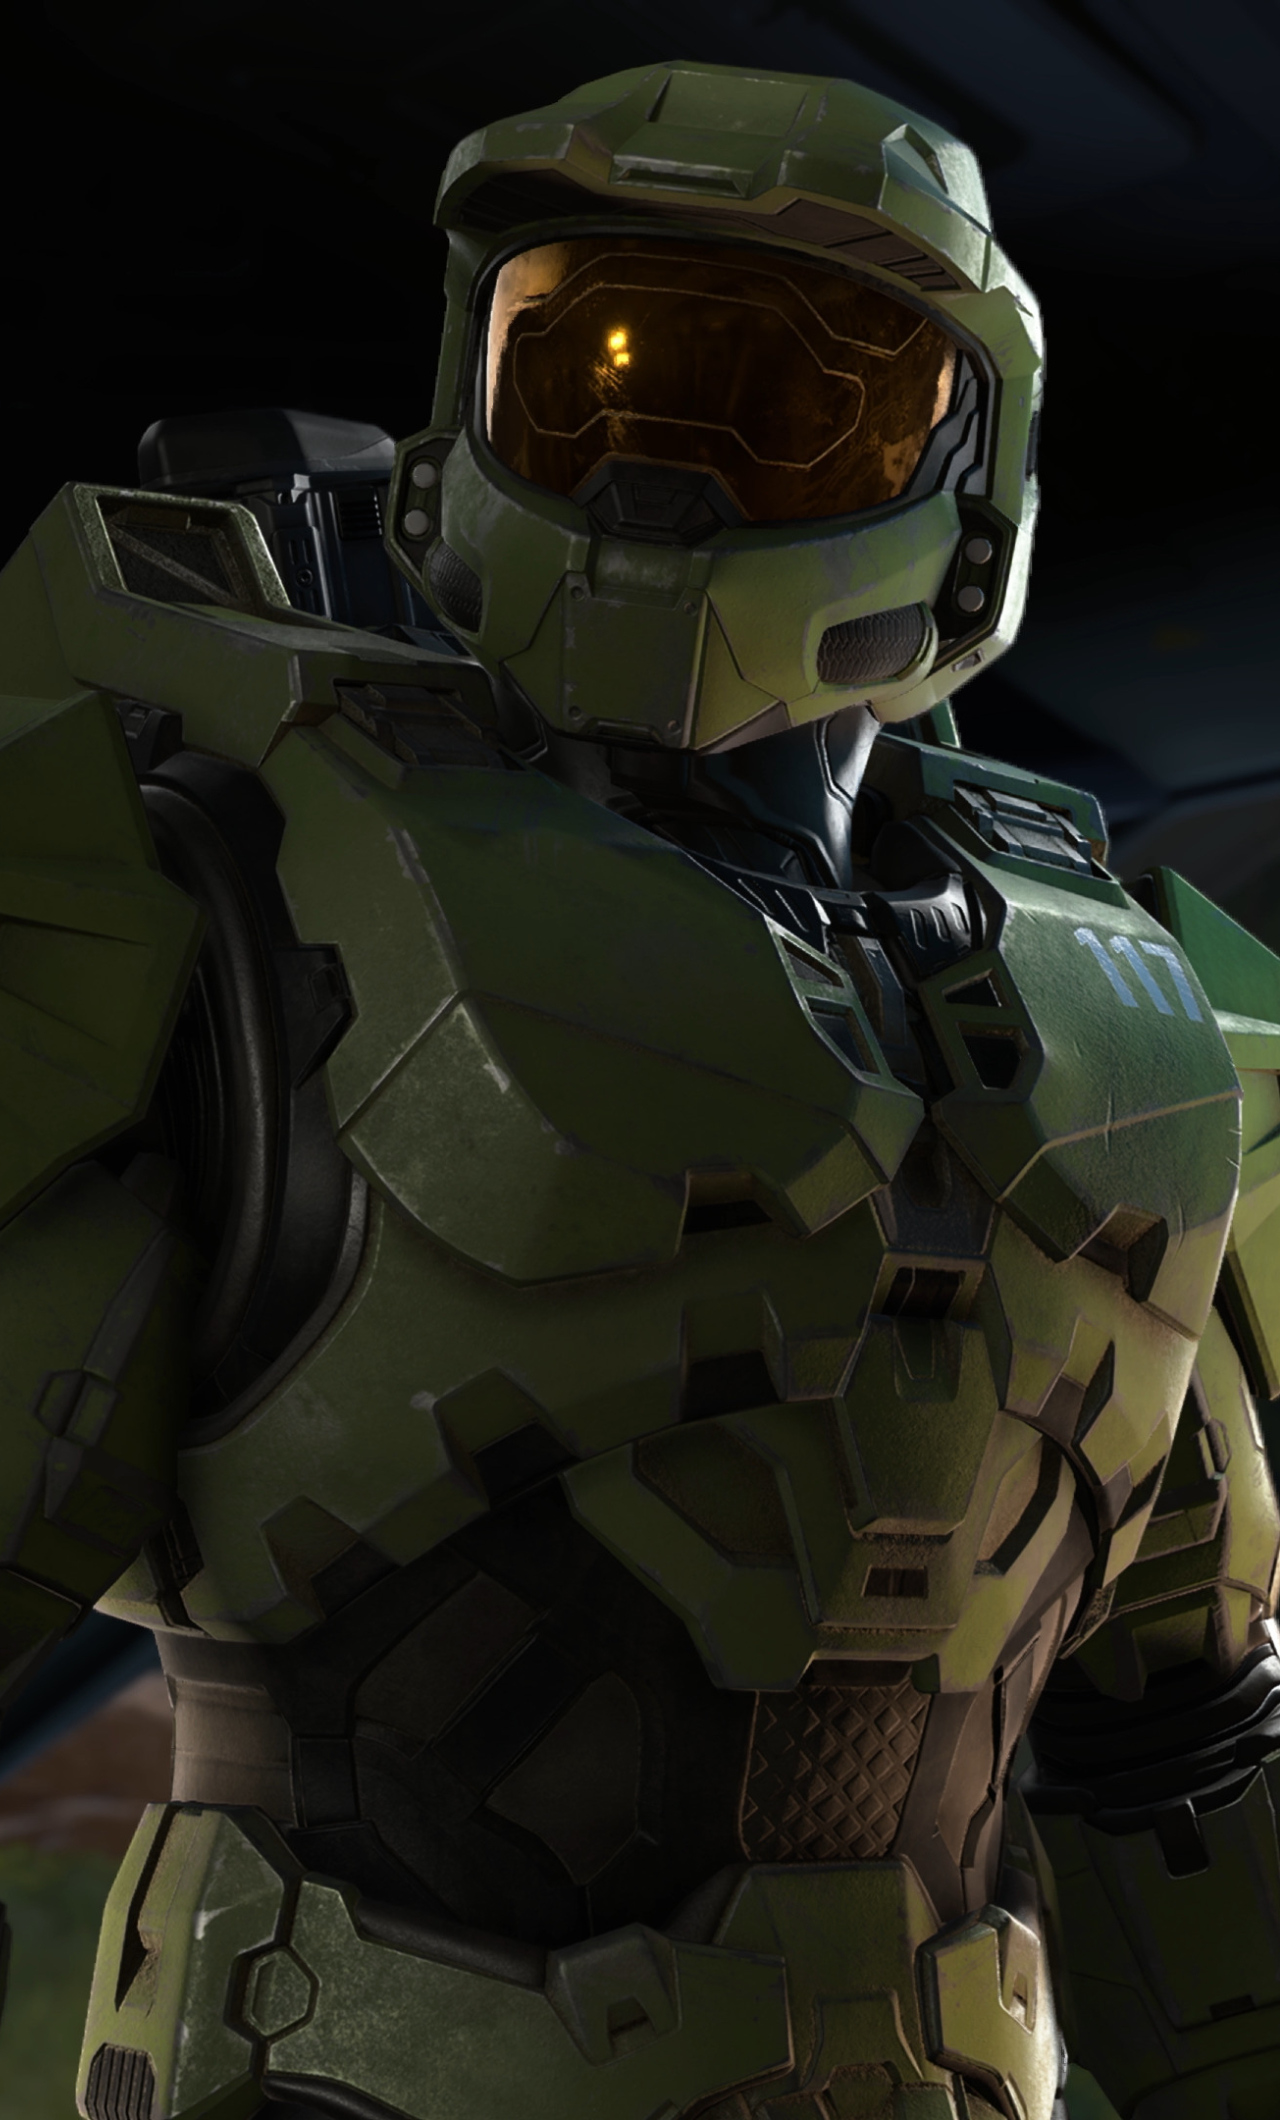 New Halo Infinite 4K Wallpaper in 1280x2120 Resolution